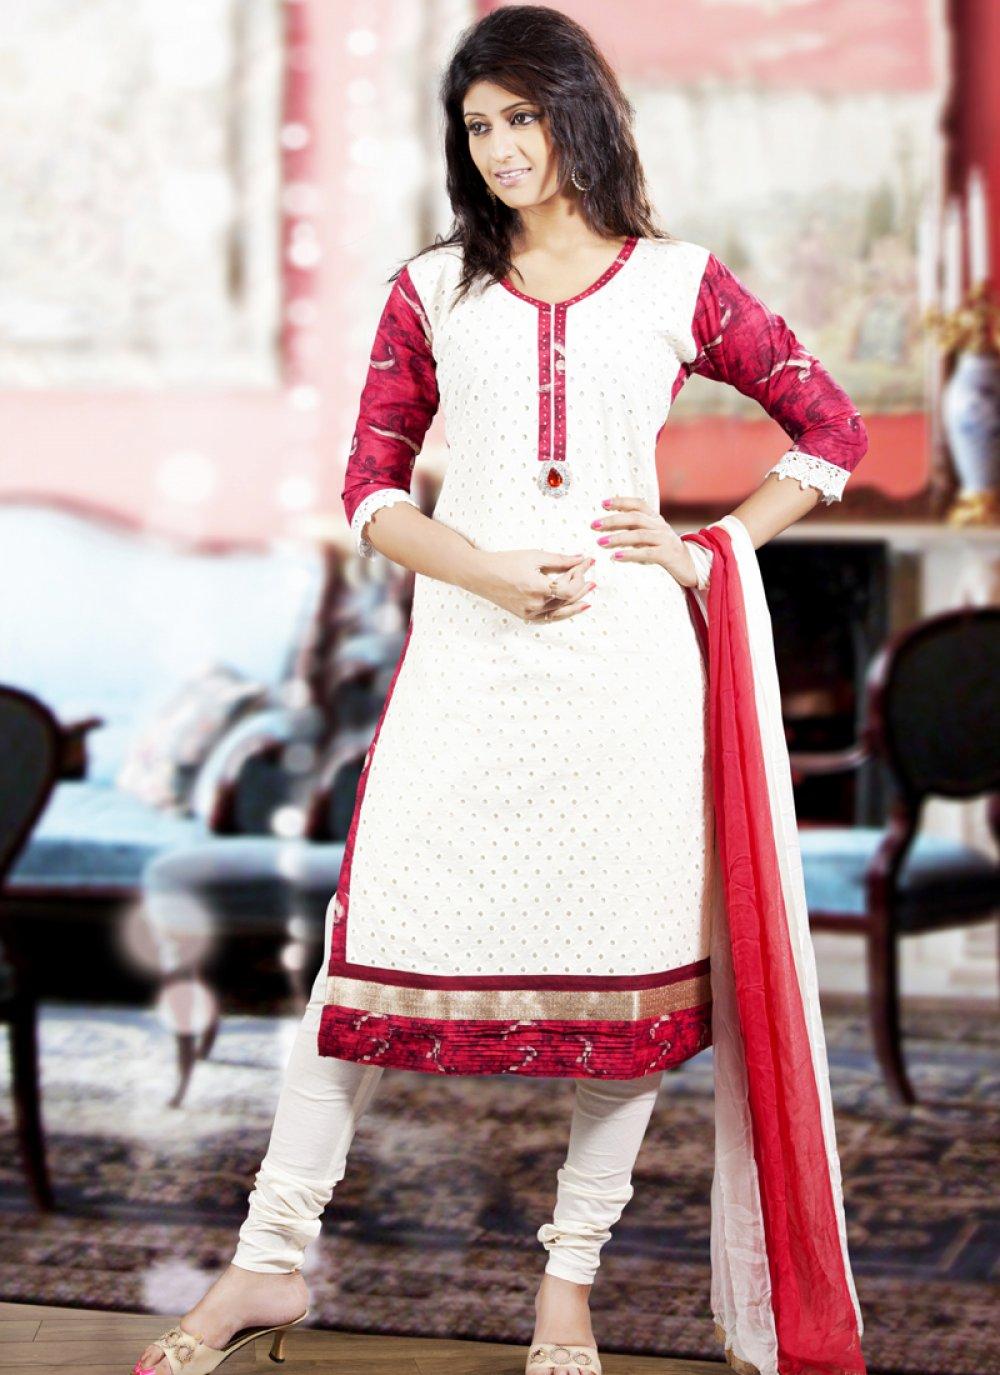 Enigmatic Deep Scarlet Red & White Salwar Kameez